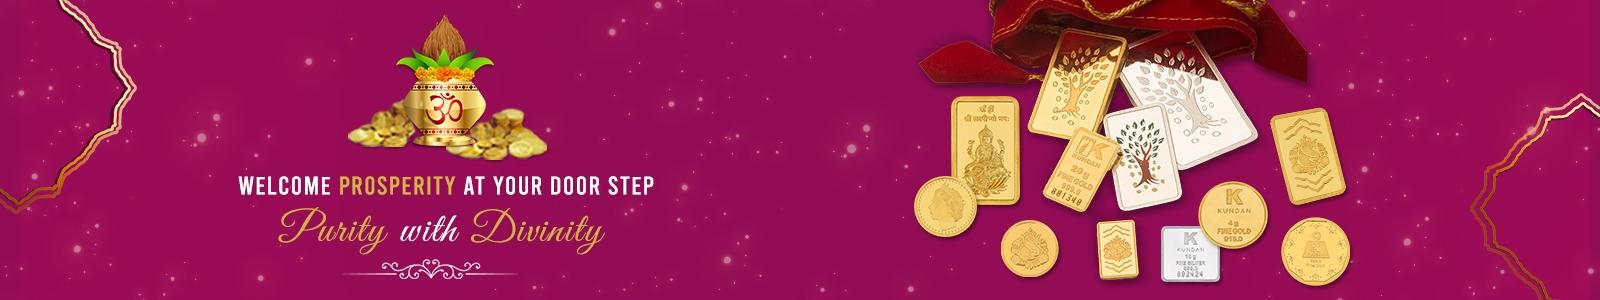 Welcome Prosperity this Akshaya Tritiya with Kundan Gold Collection